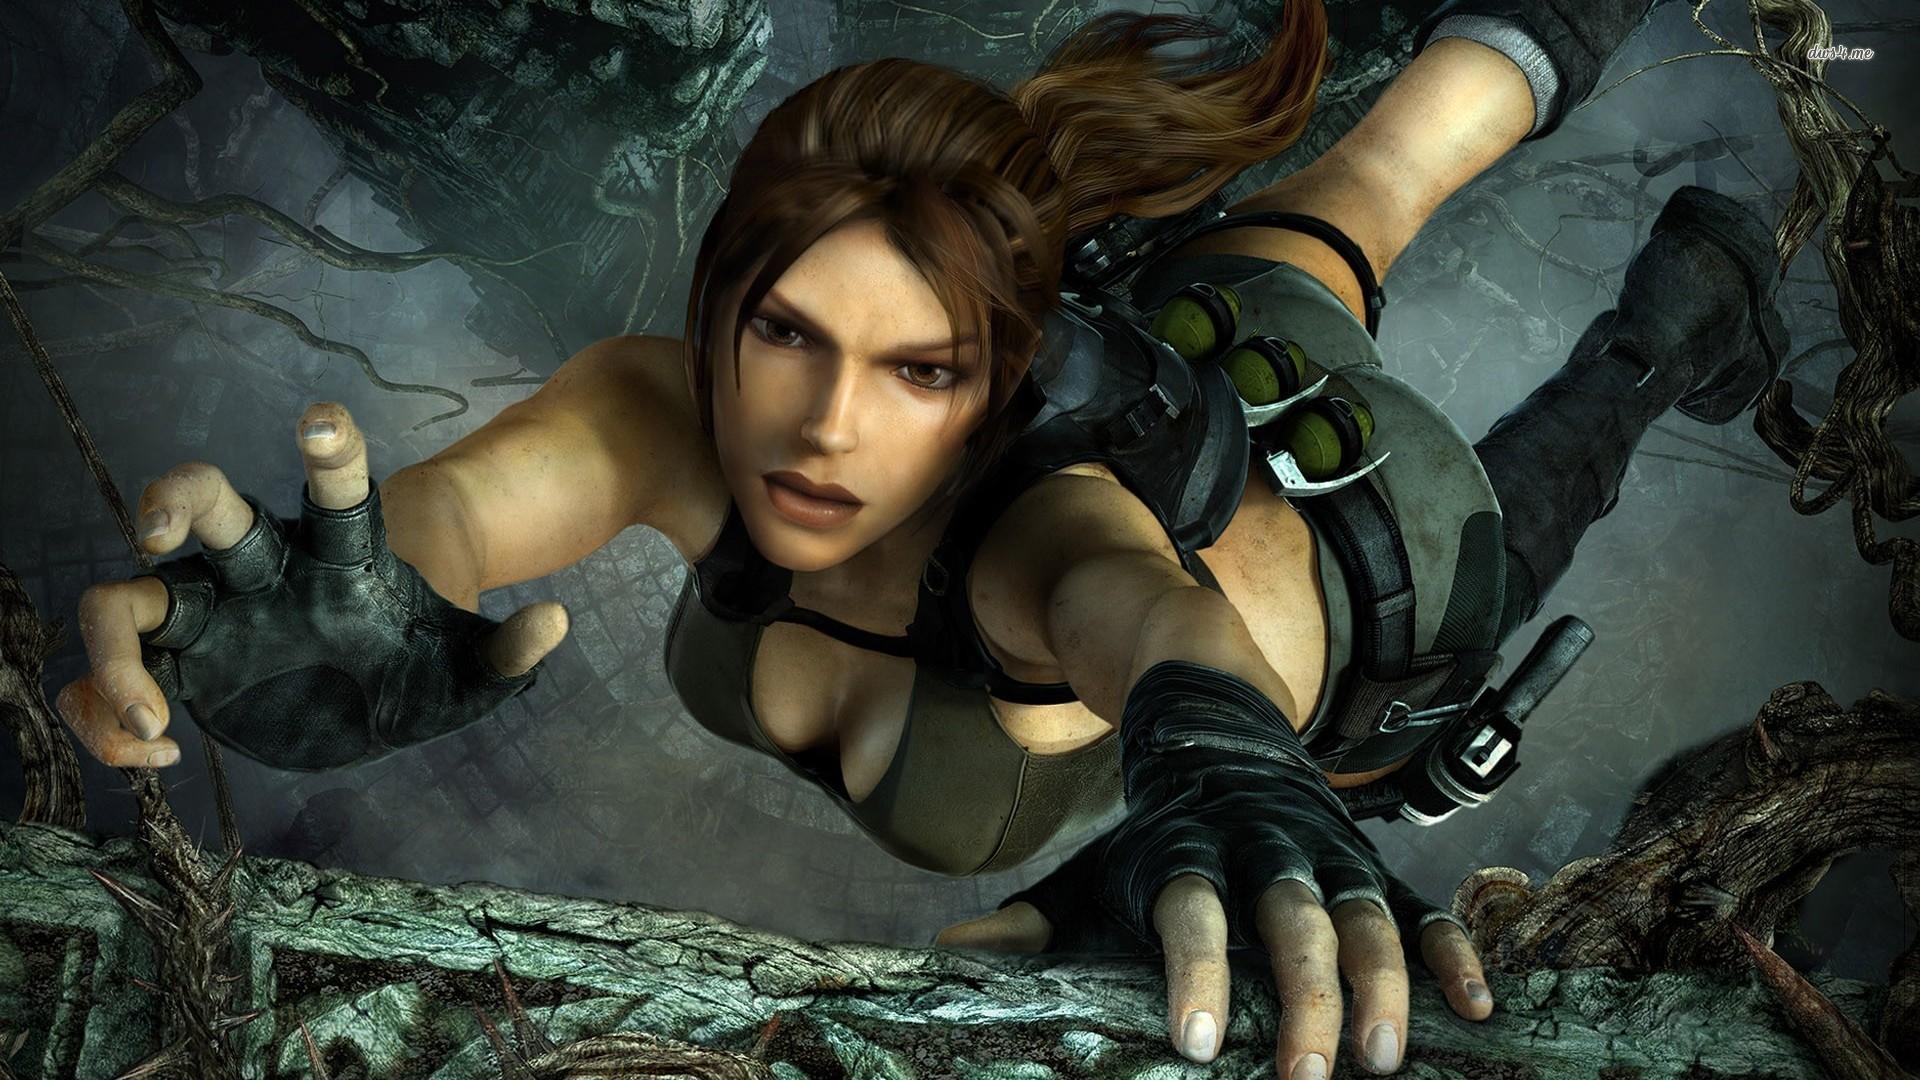 Lara croft lesbian hentai videos xxx download